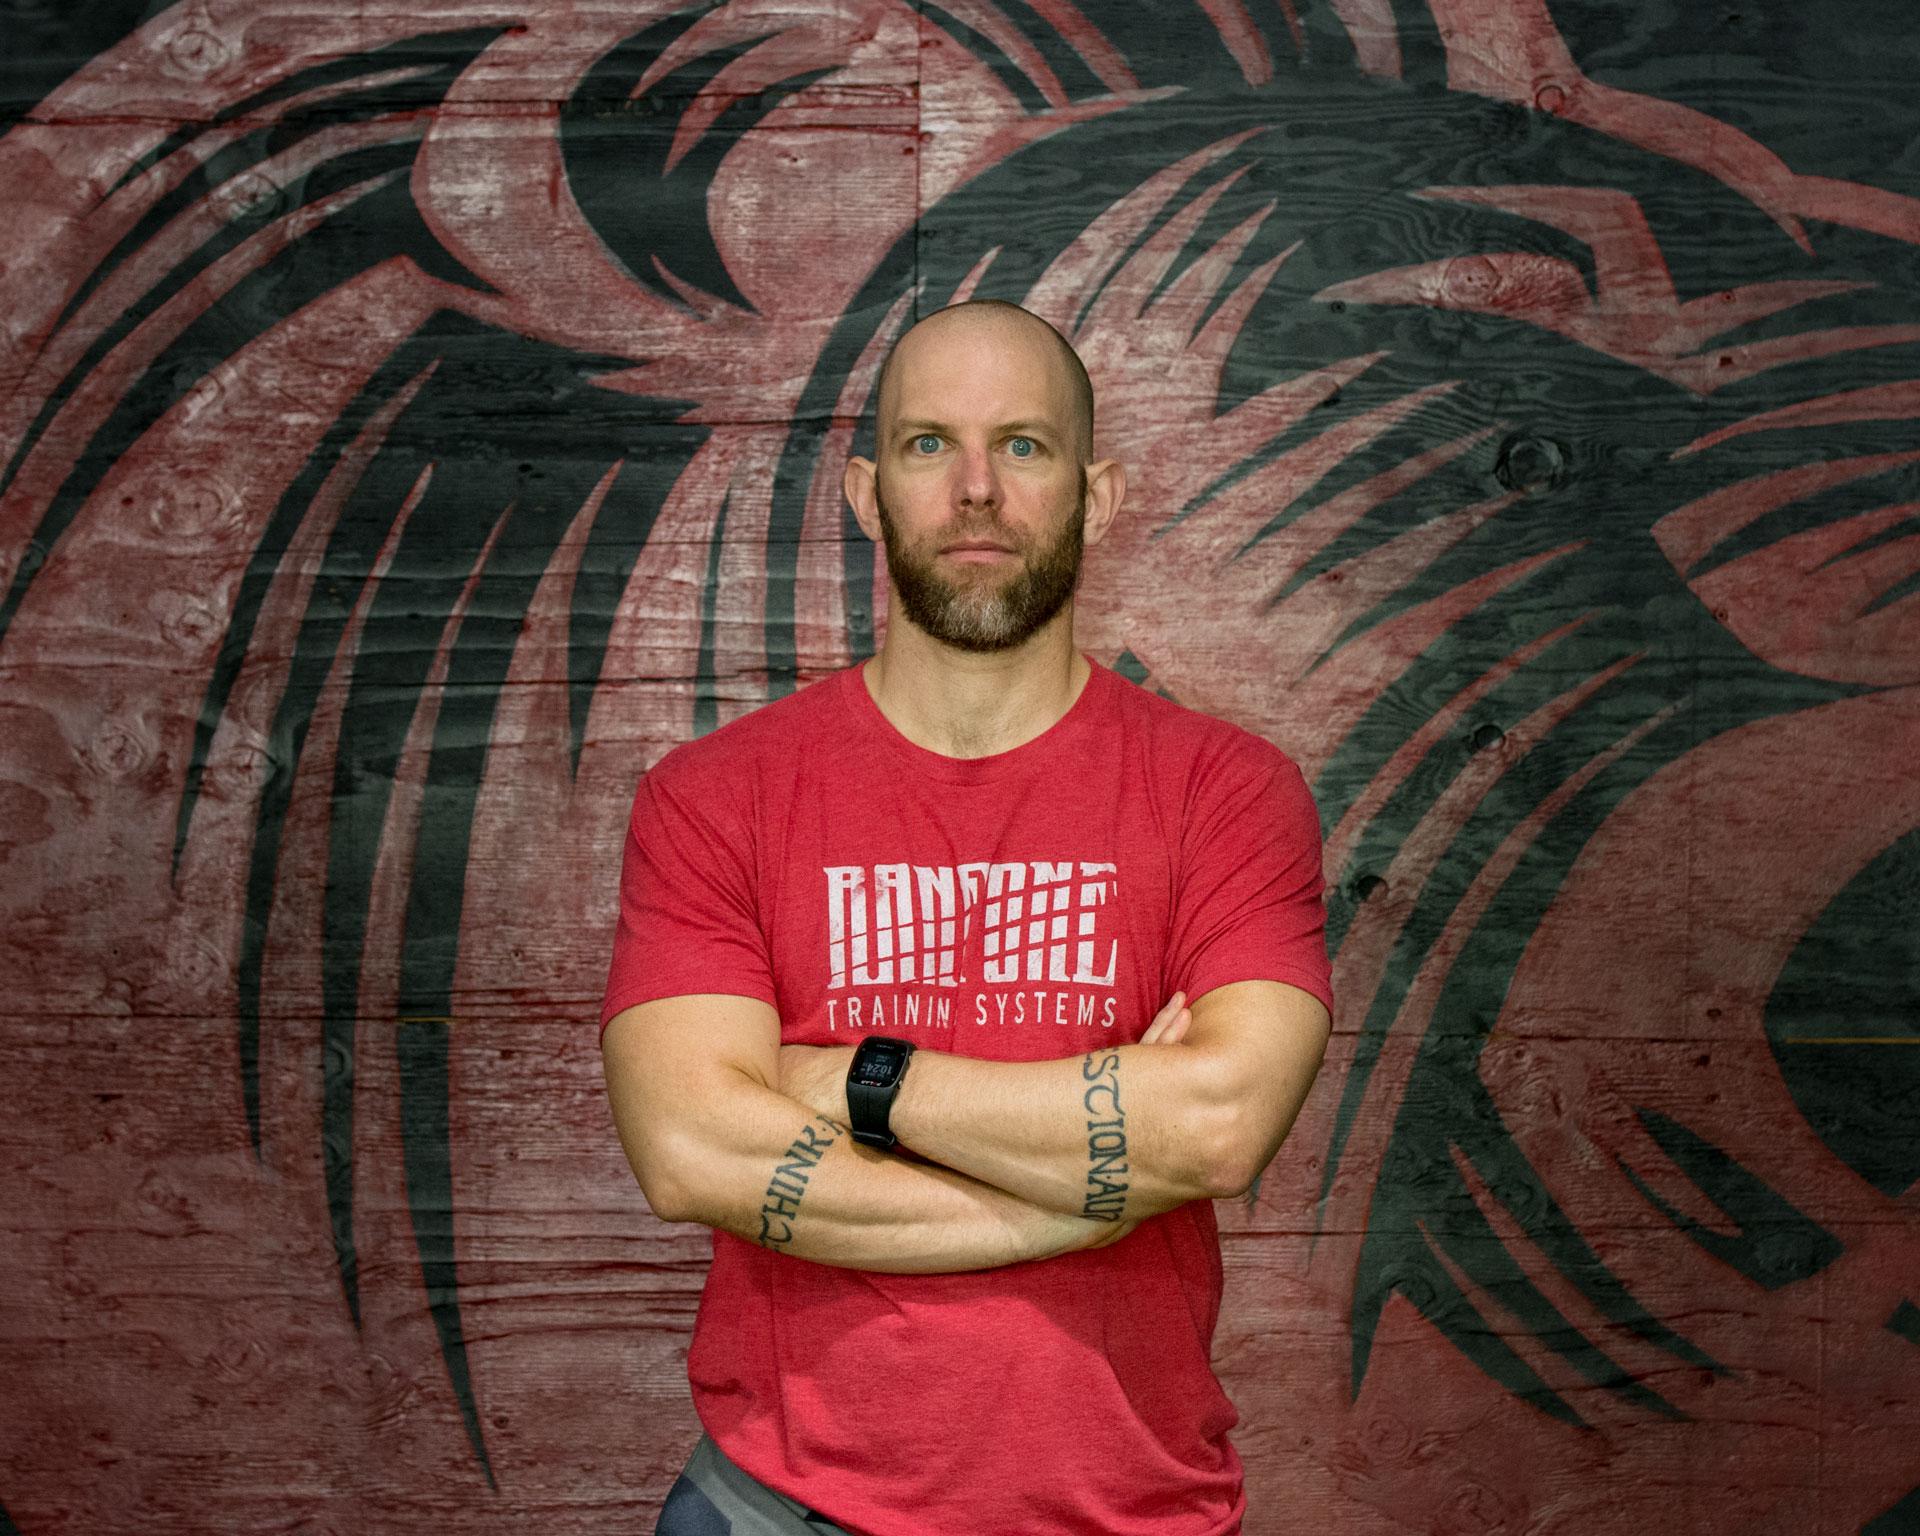 Scott-head-shot-5x4.jpg